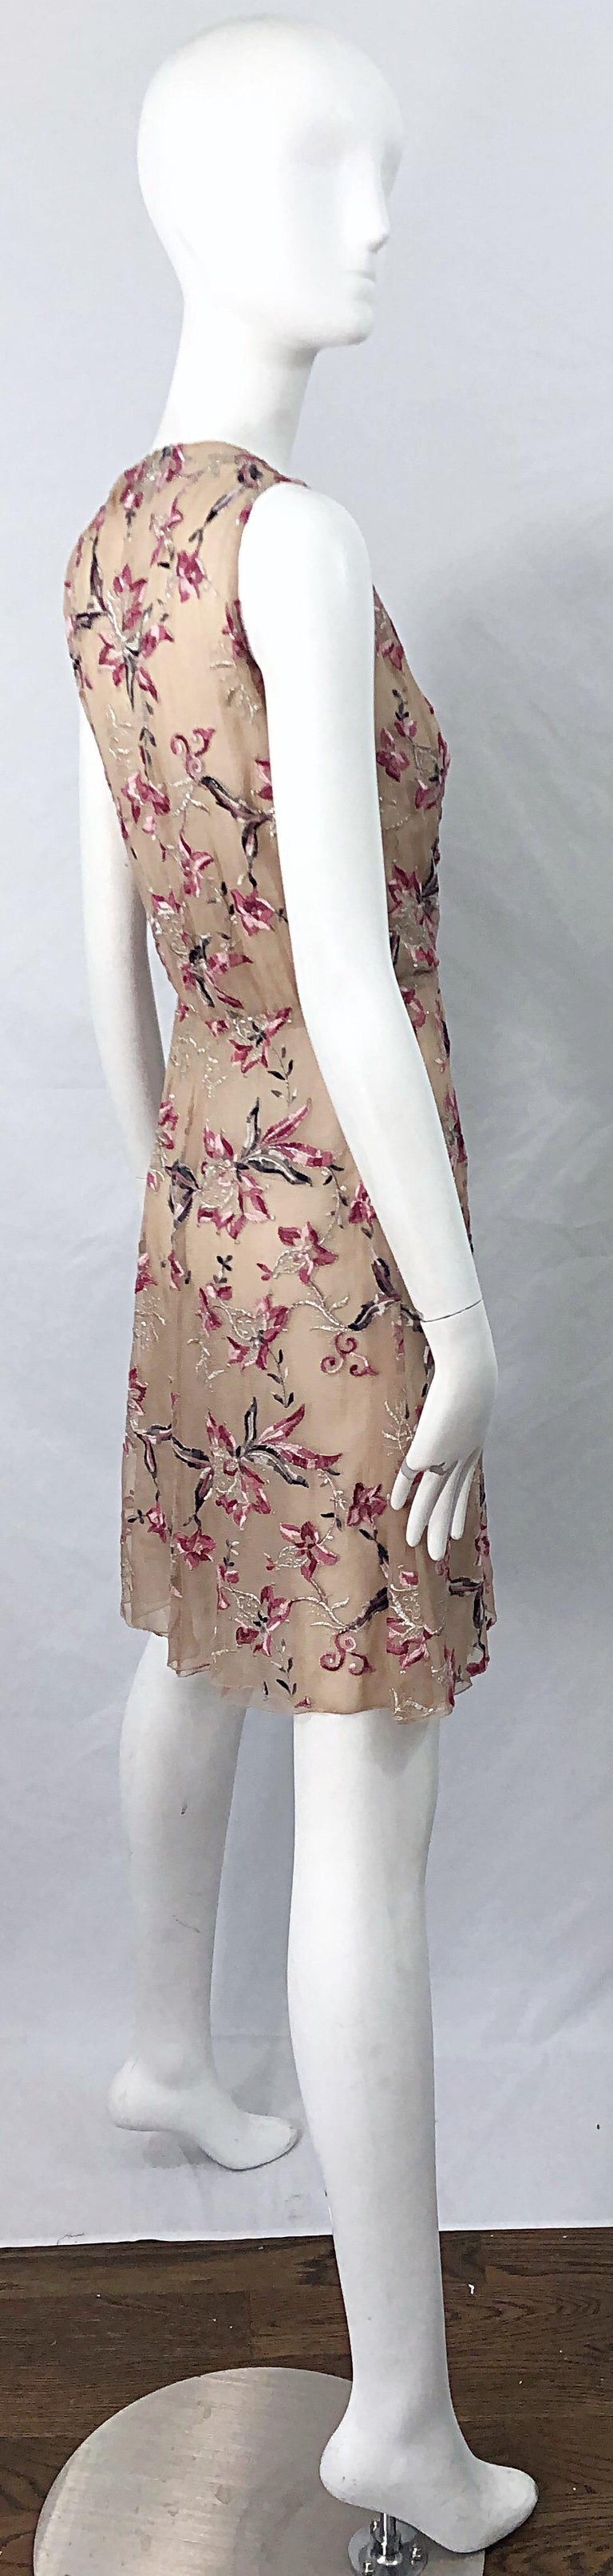 Women's Beautiful 1990s Valentino Nude Silk Chiffon Semi Sheer Size 6 Embroidered Dress For Sale